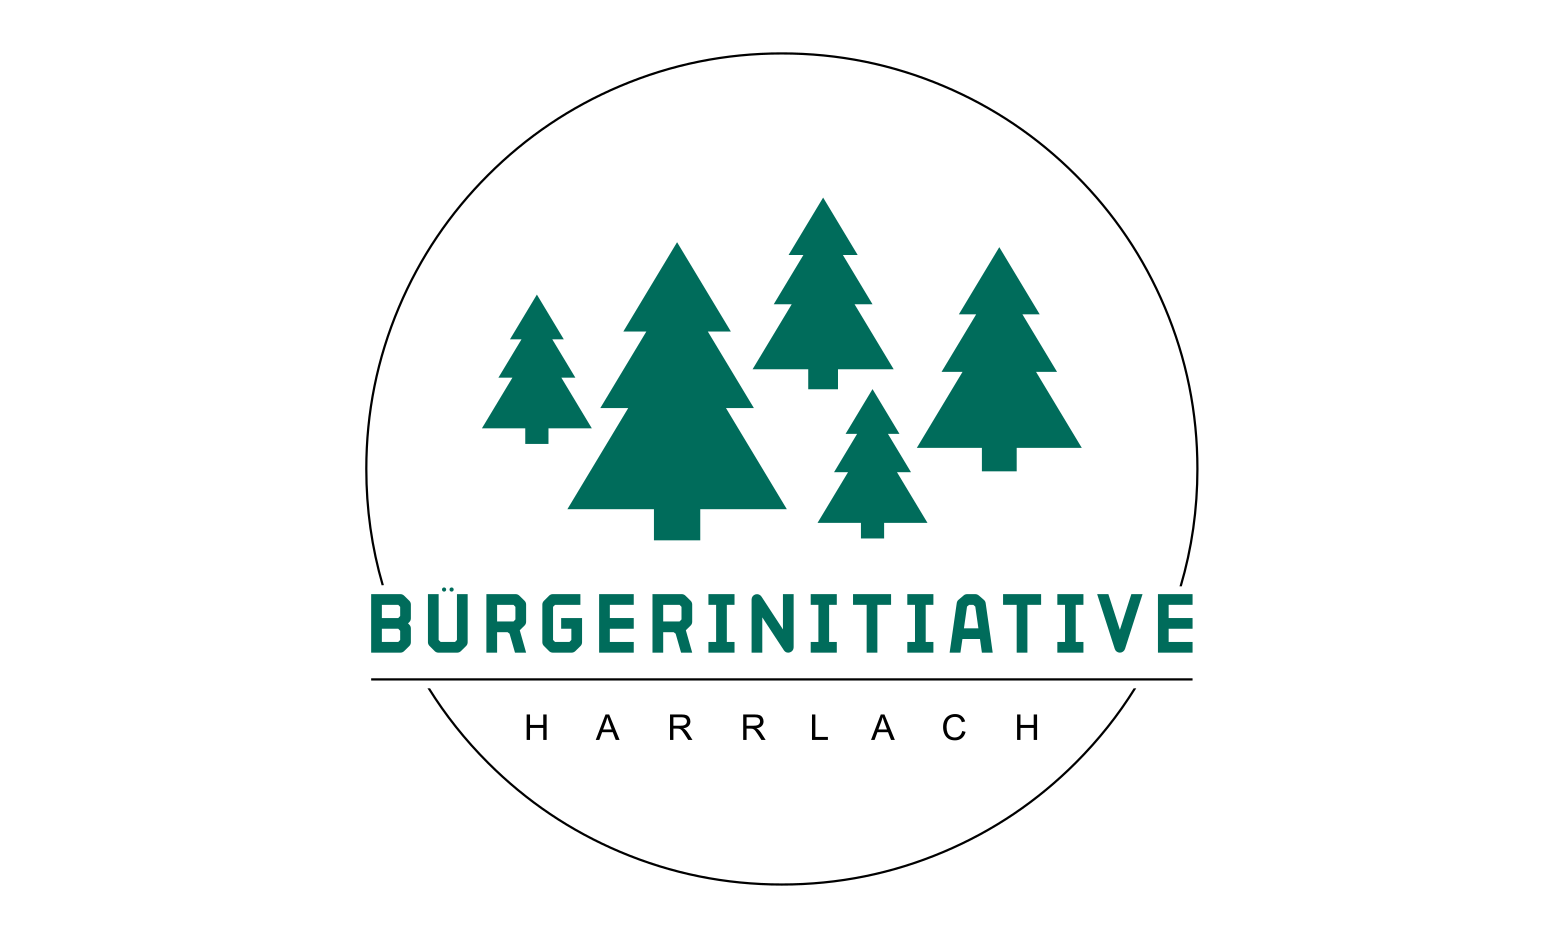 BI Harrlach